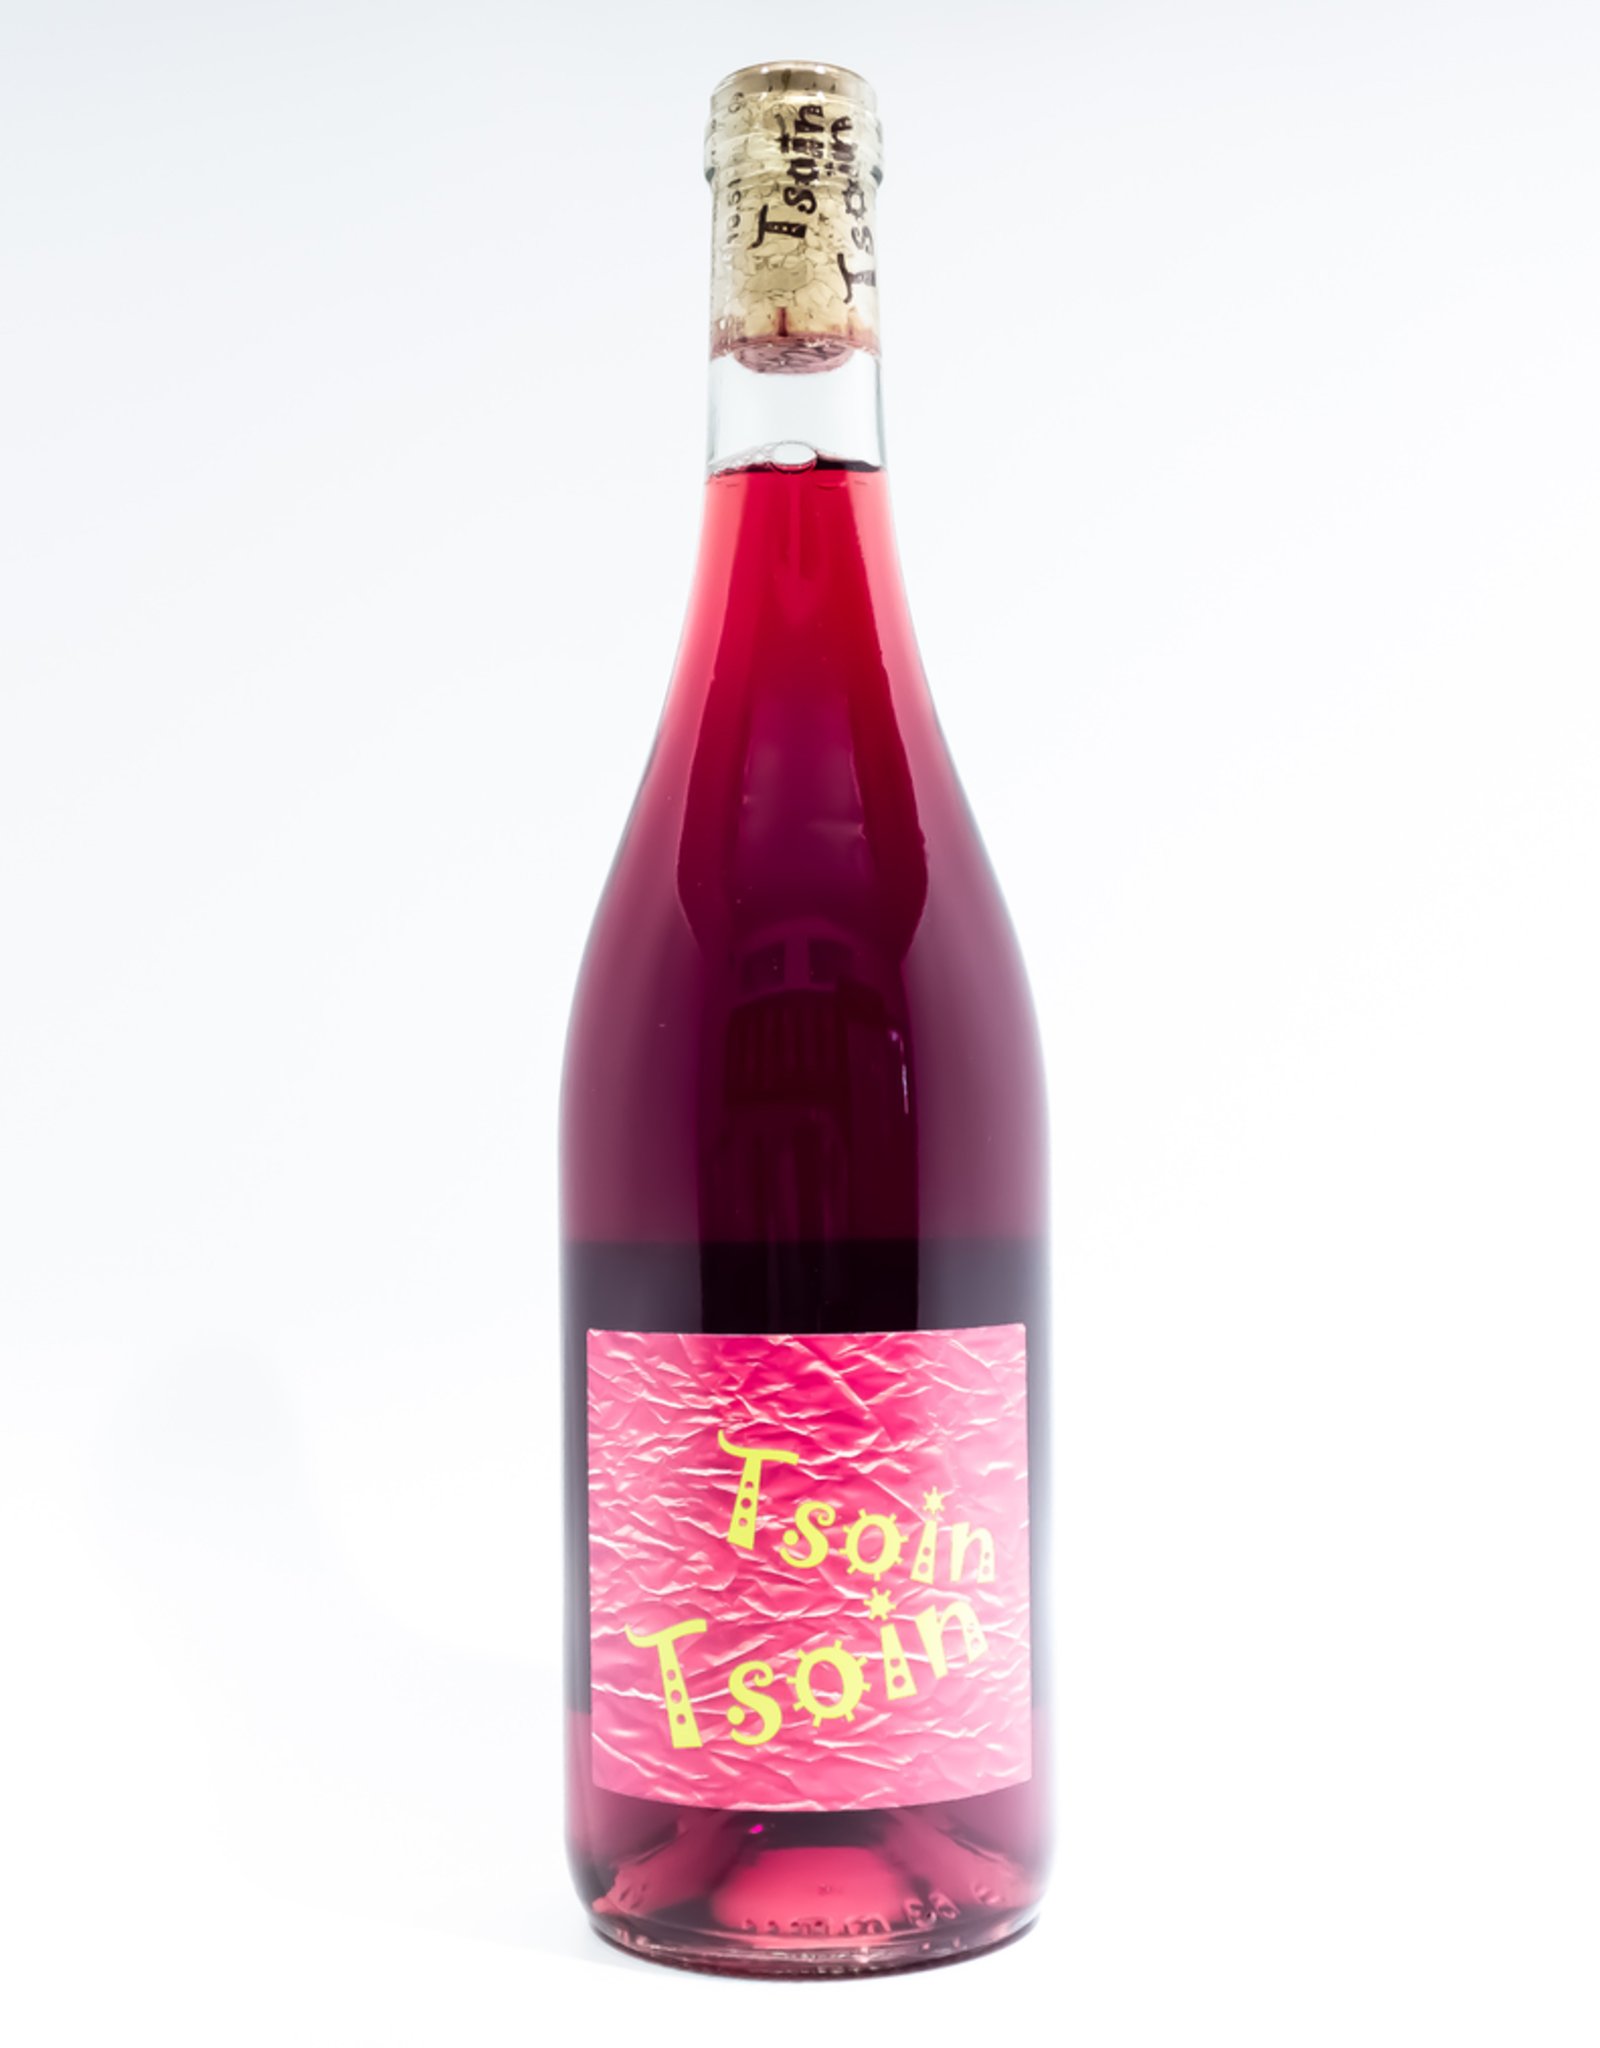 Wine-Red-Light Laurent Herlin 'Tsoin Tsoin' Bourgueil AOC 2019